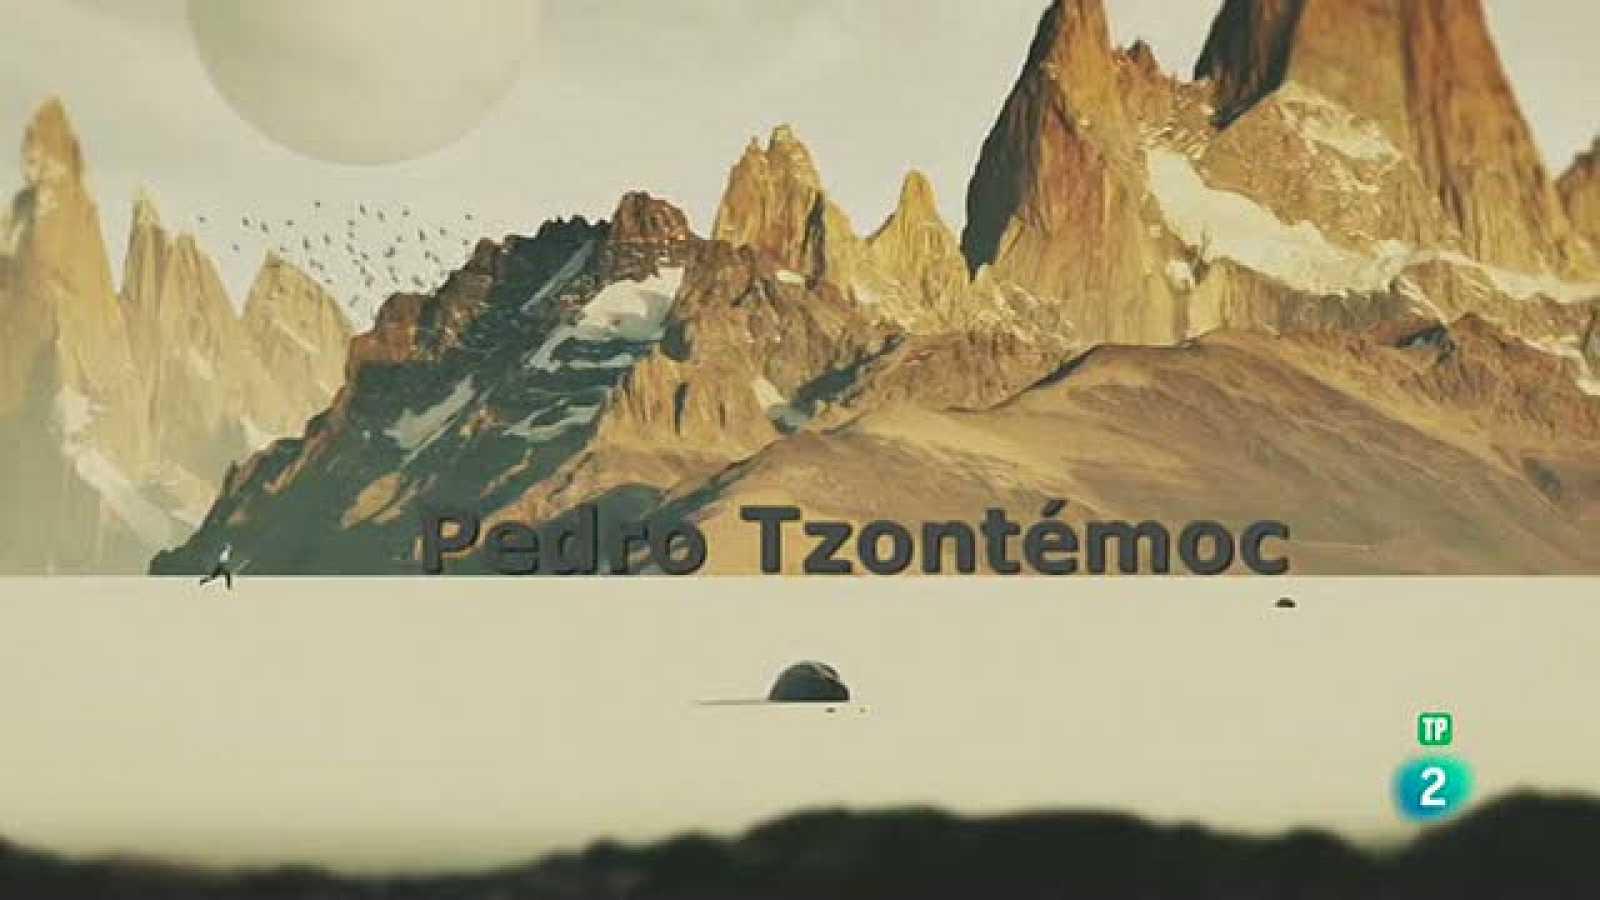 La Aventura del Saber. TVE. Boek Visual: Pedro Tzontemoc